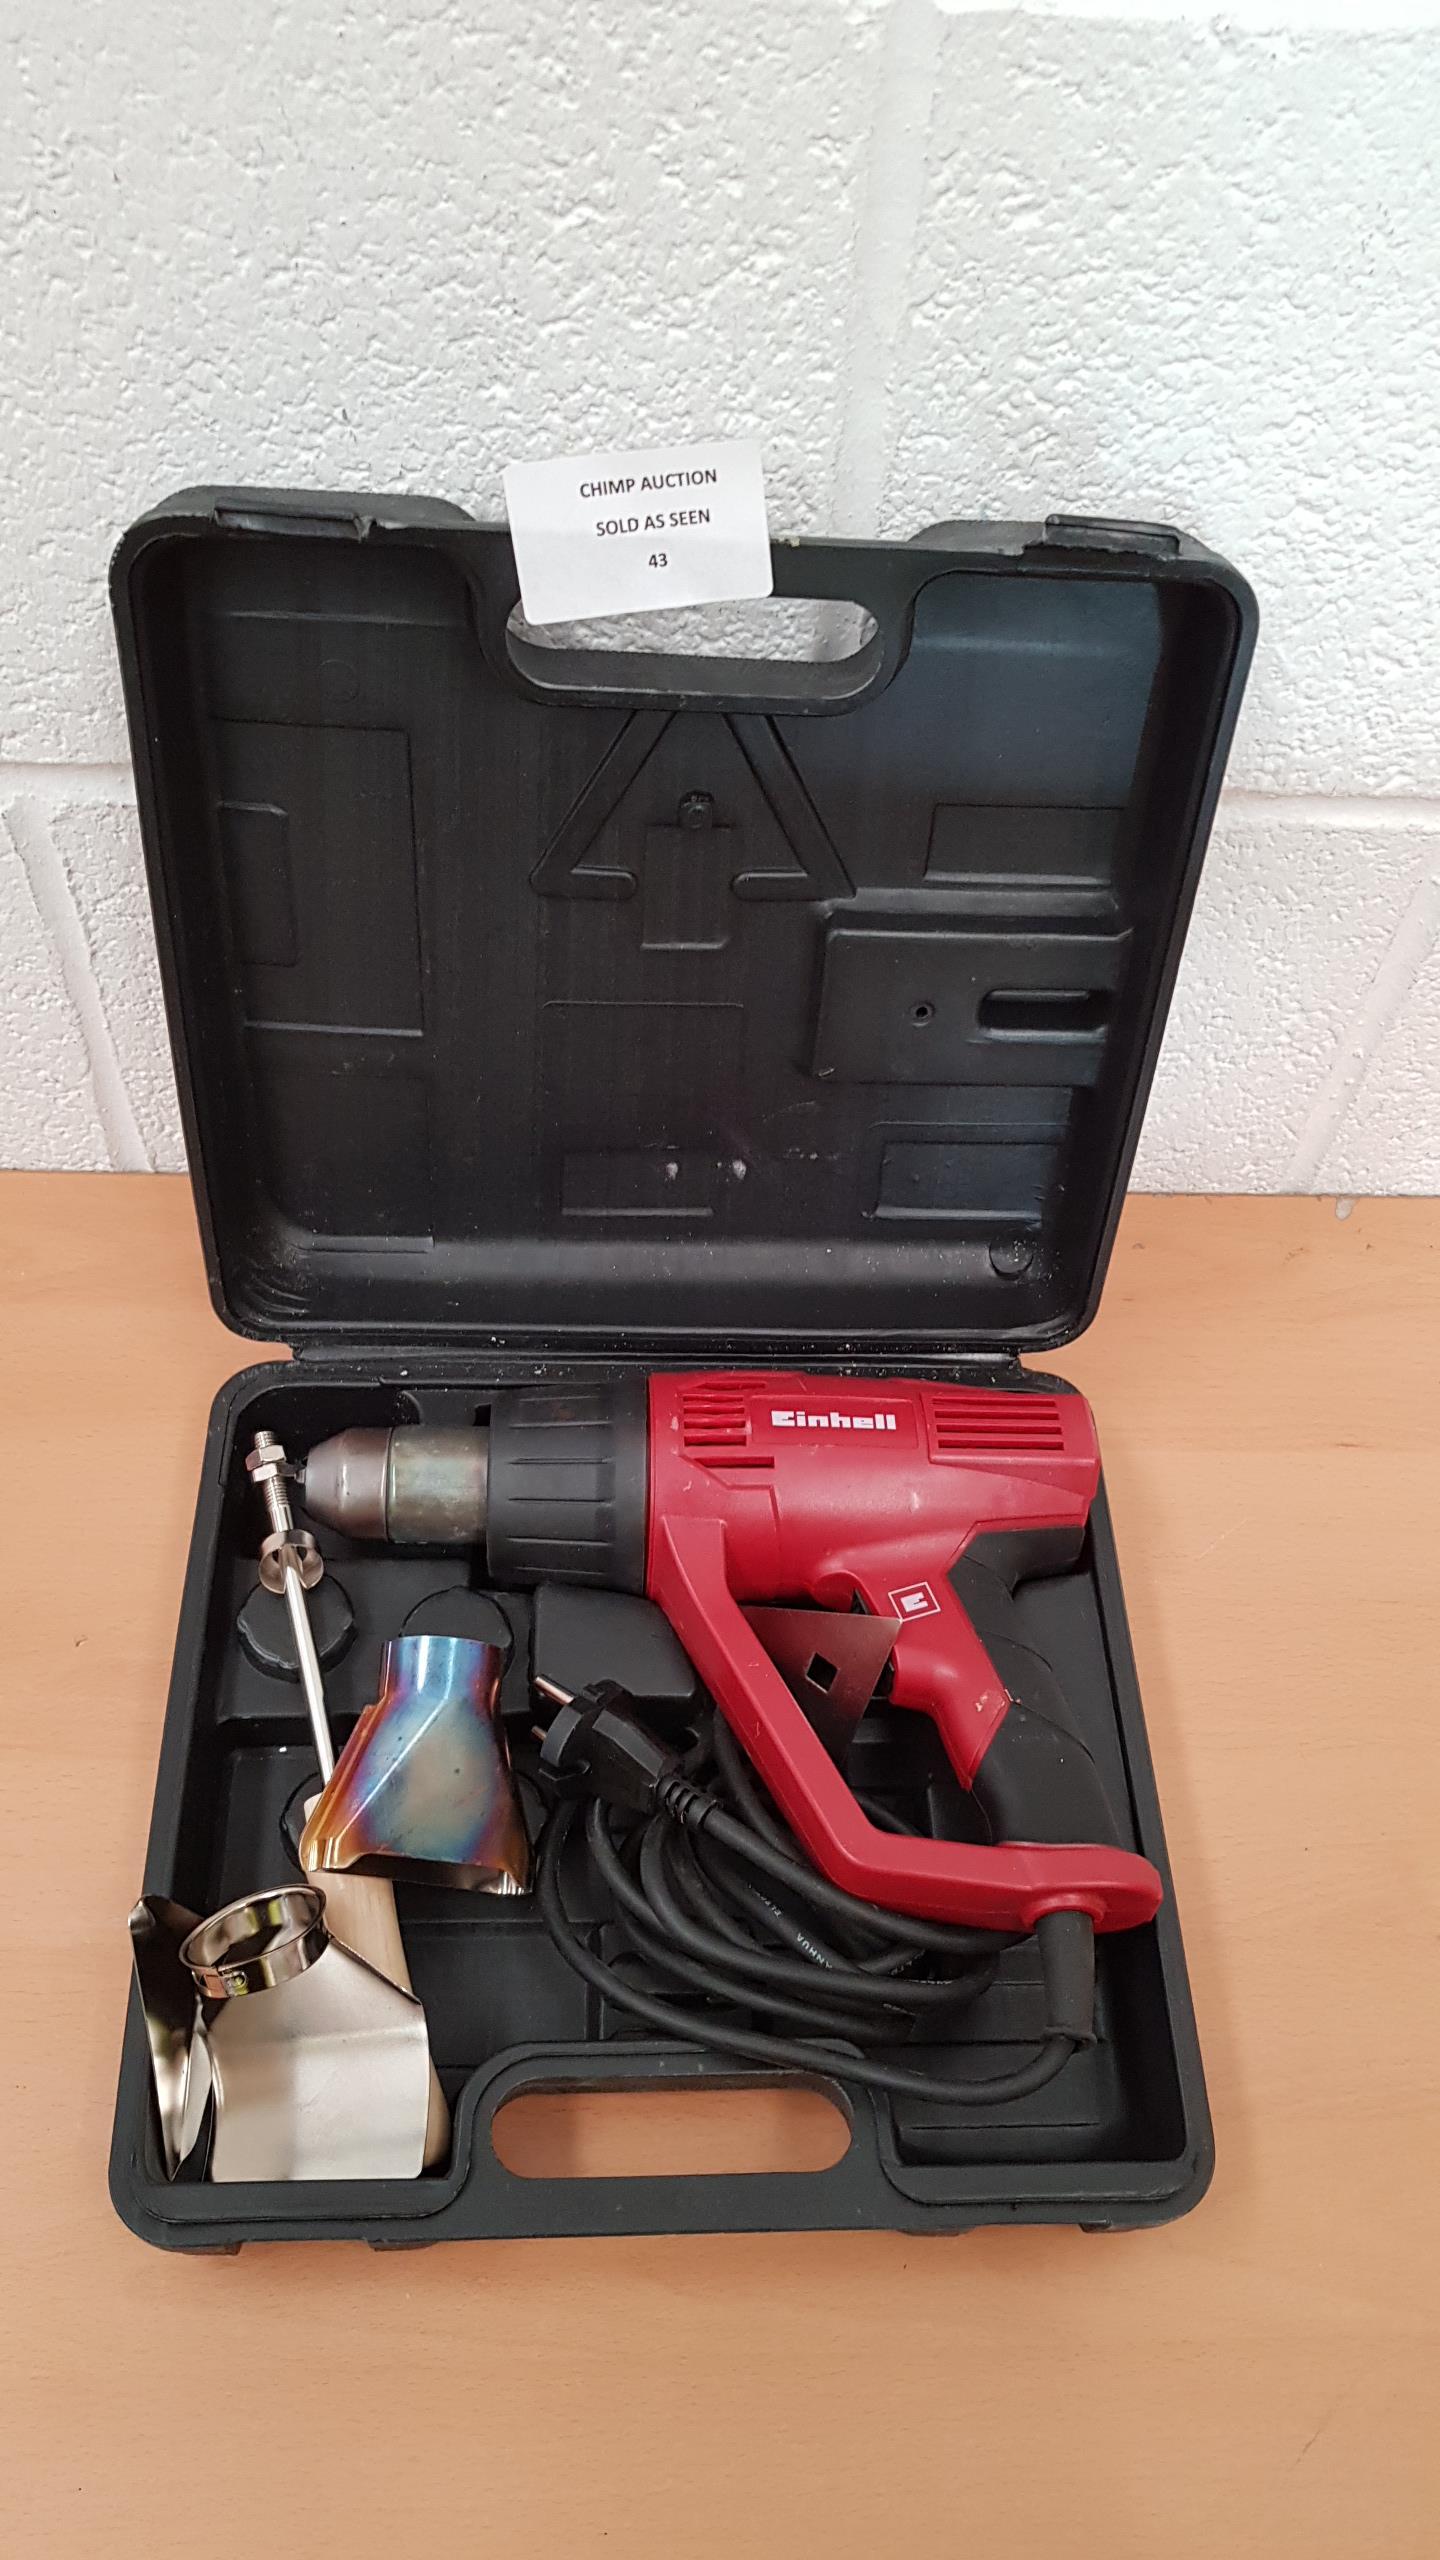 Lot 43 - Einhell Heat Gun